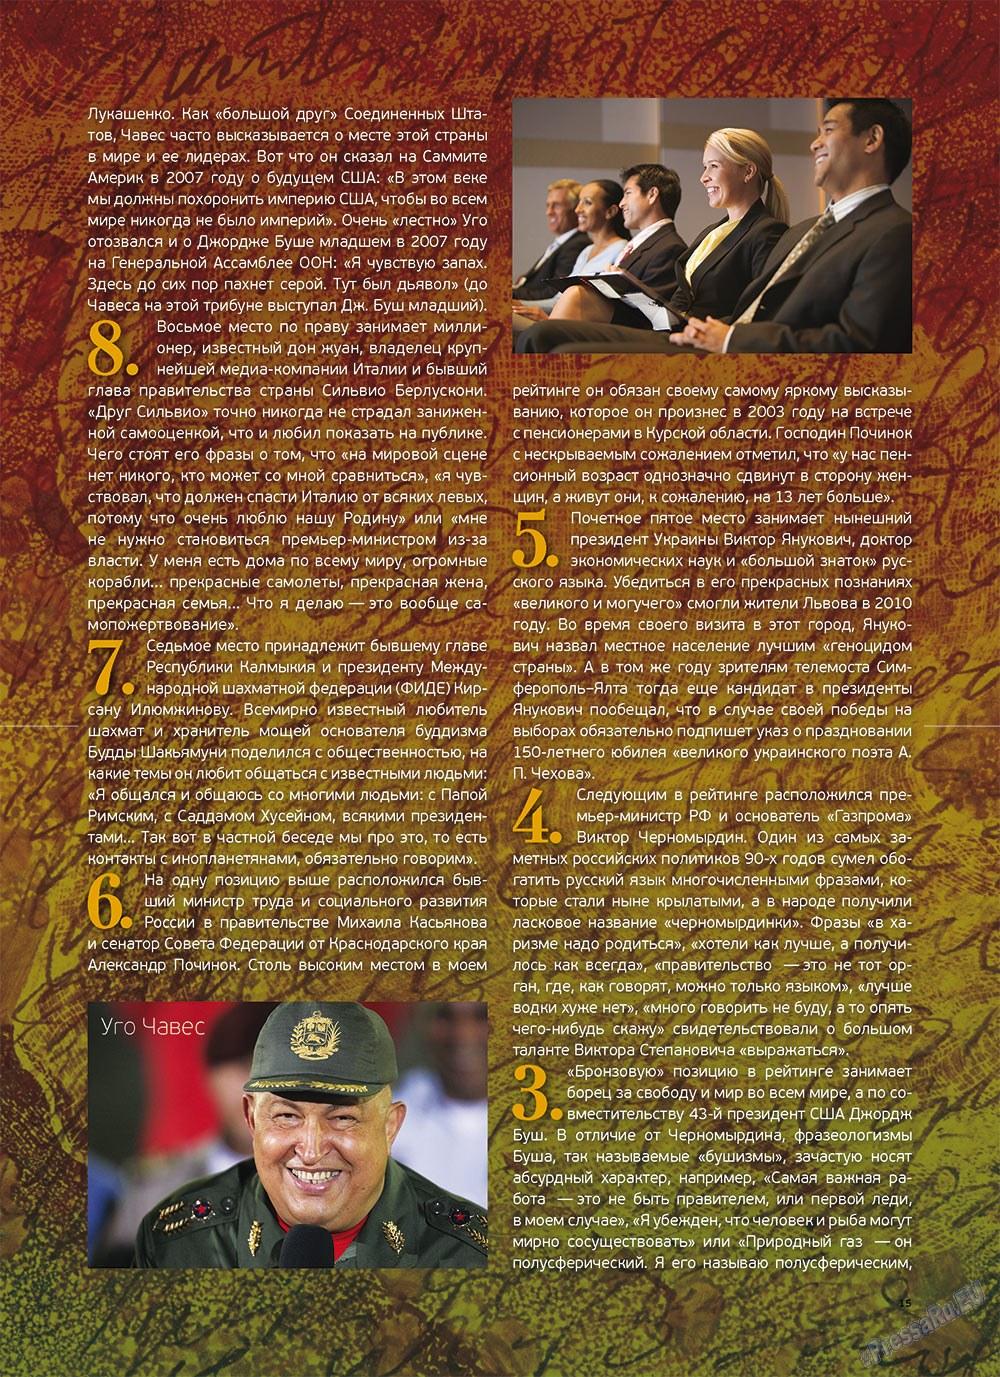 Артек (журнал). 2012 год, номер 3, стр. 17